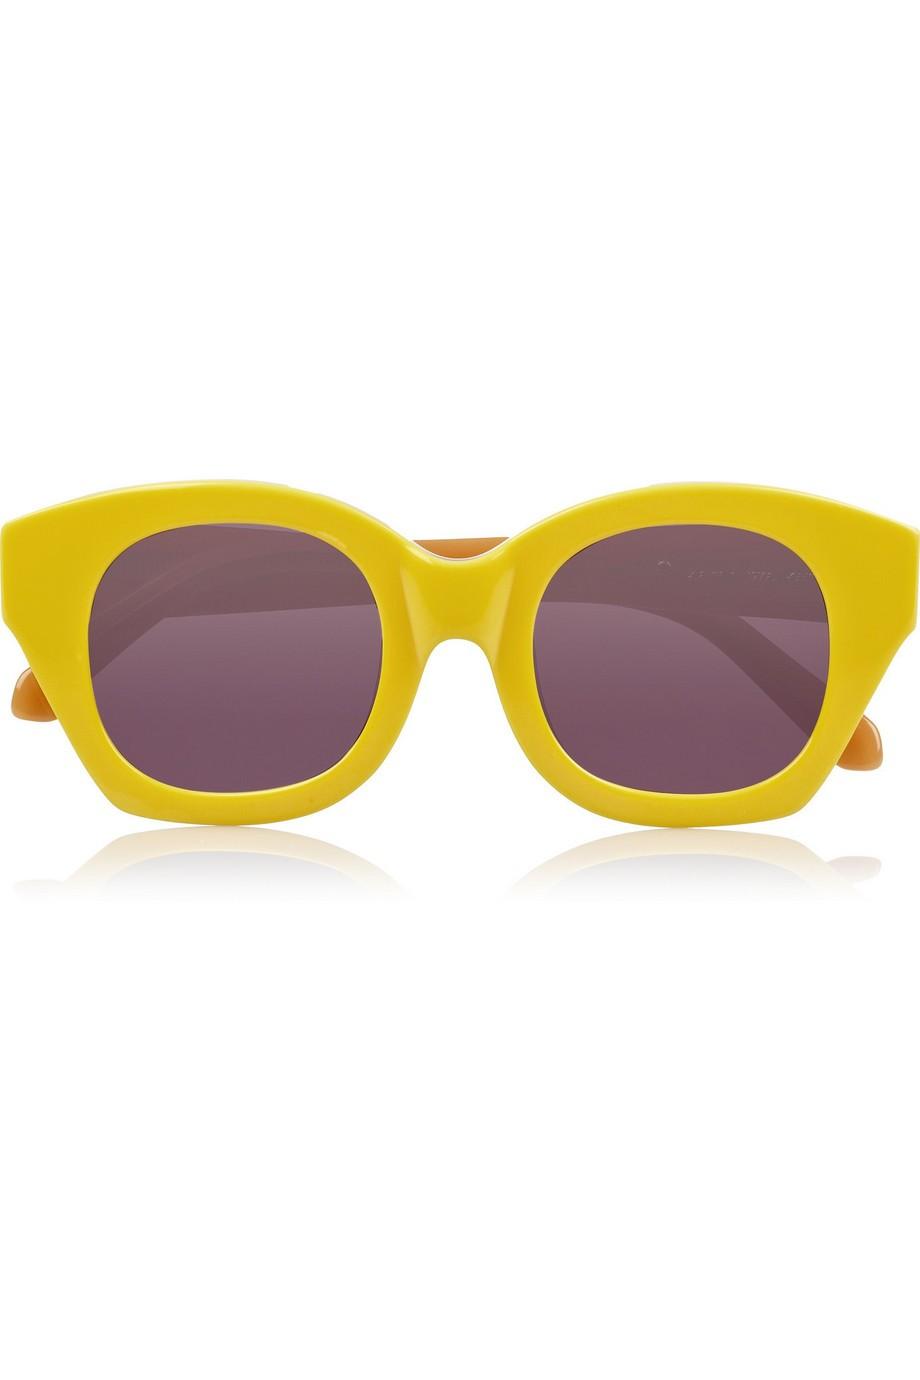 Soul Club cat eye acetate sunglasses